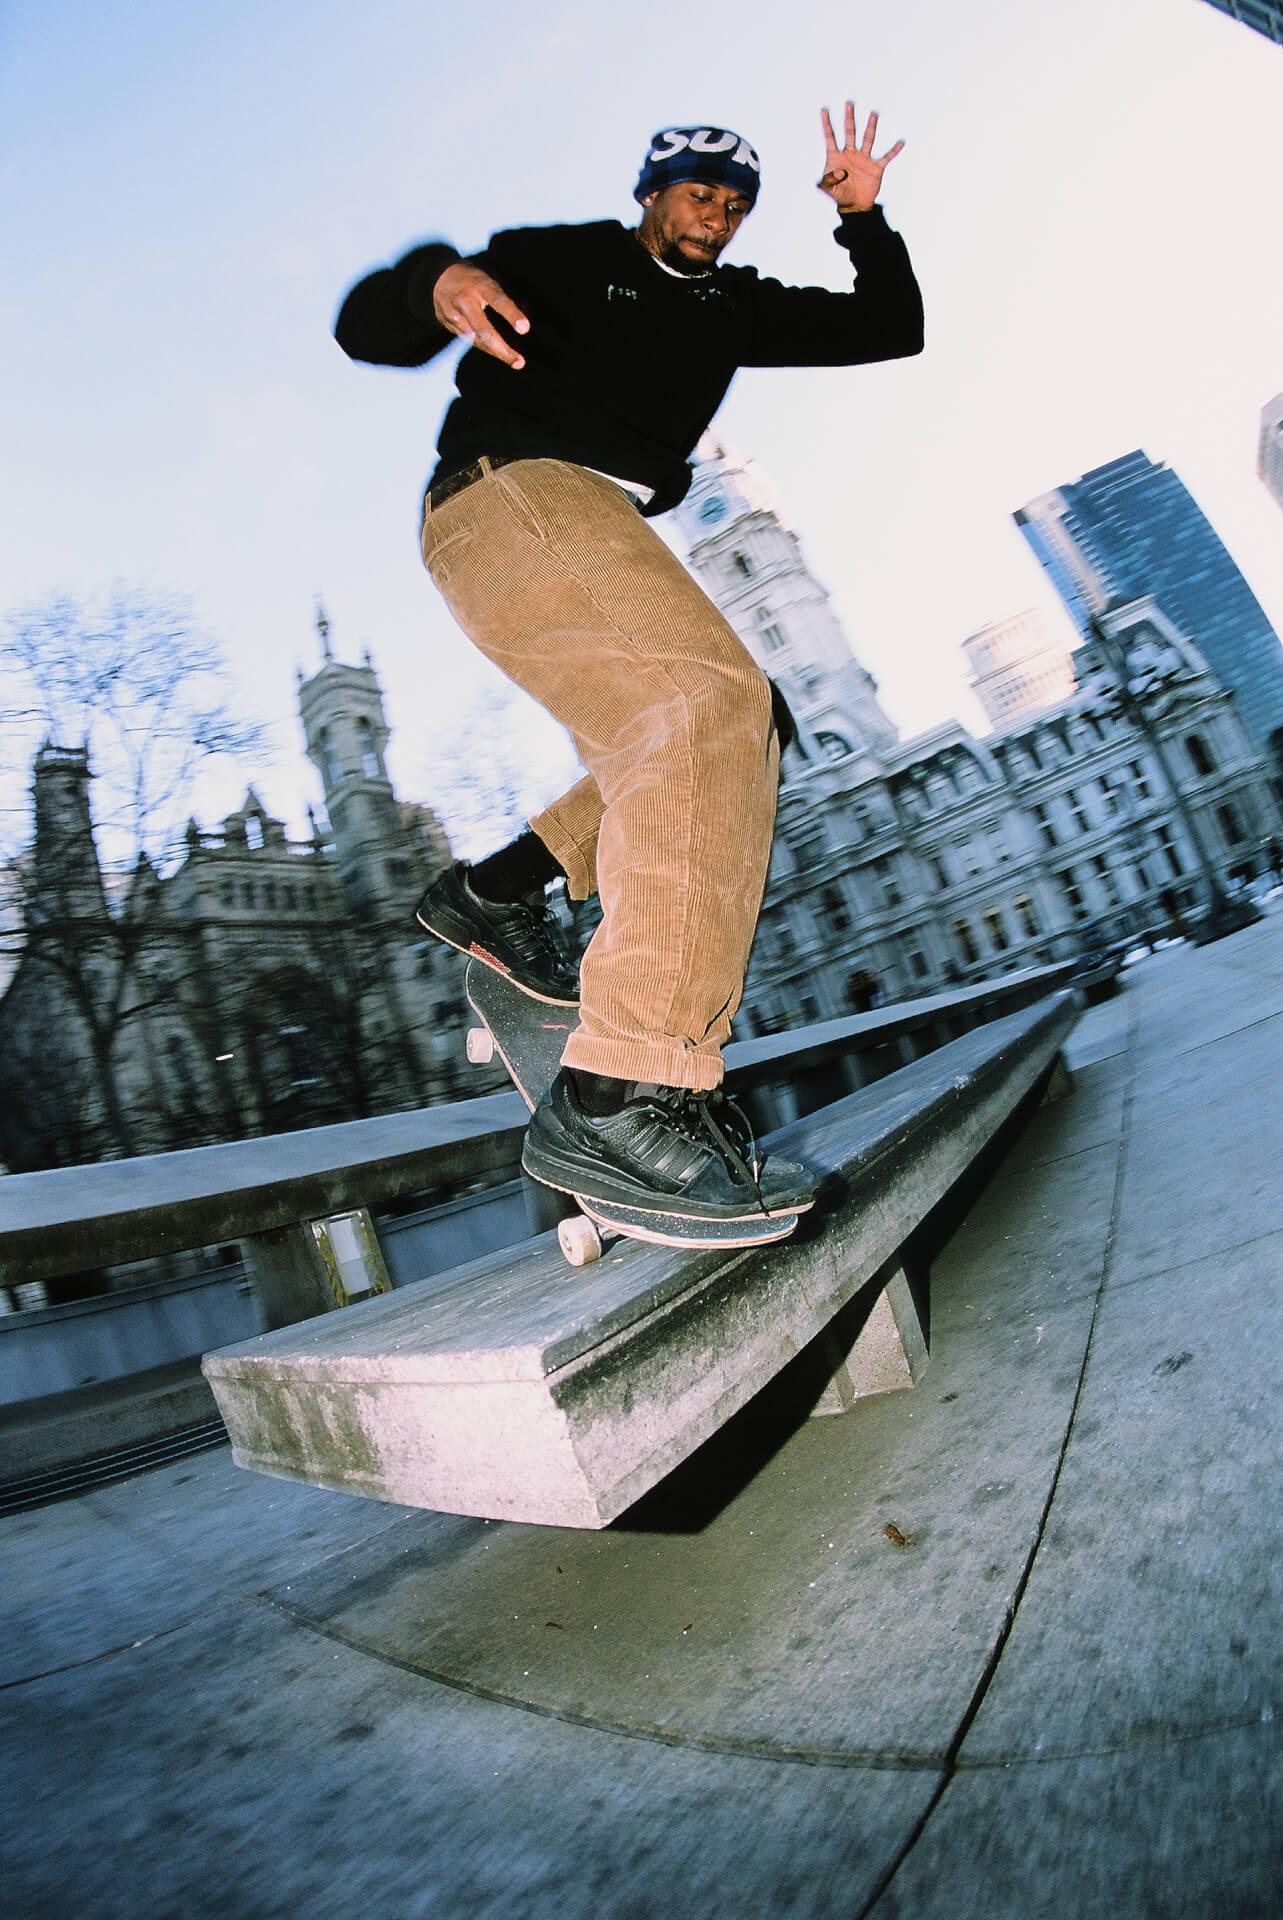 adidas Skateboarding「FORUM 84 ADV」に春夏仕様の新色が登場!チョークホワイト&ブラックの2色 life210324_adidasskateboarding_9